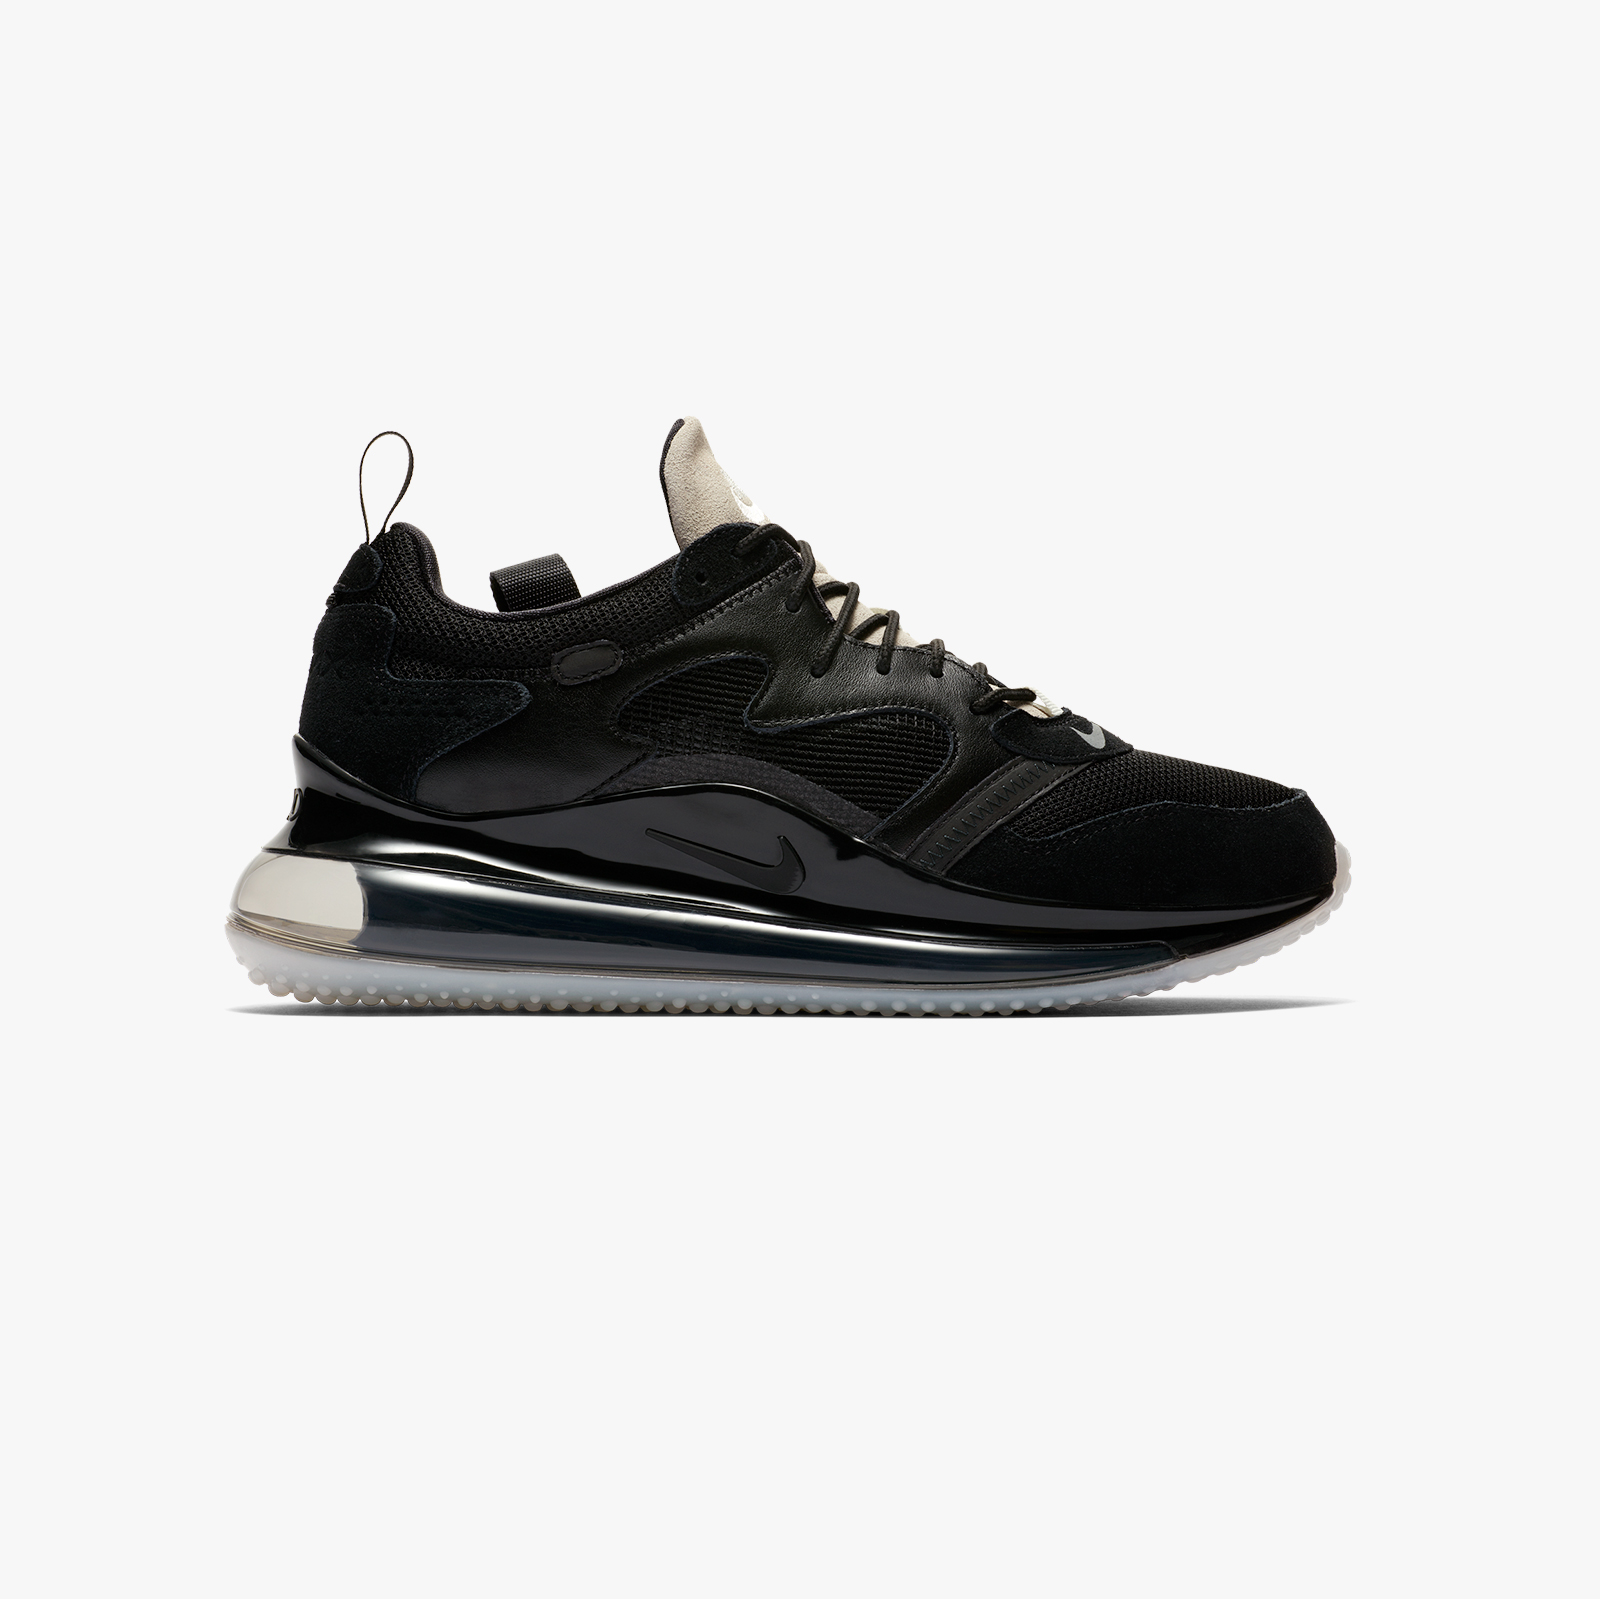 Kicks Deals – Official Website OBJ x Nike Air Max 720